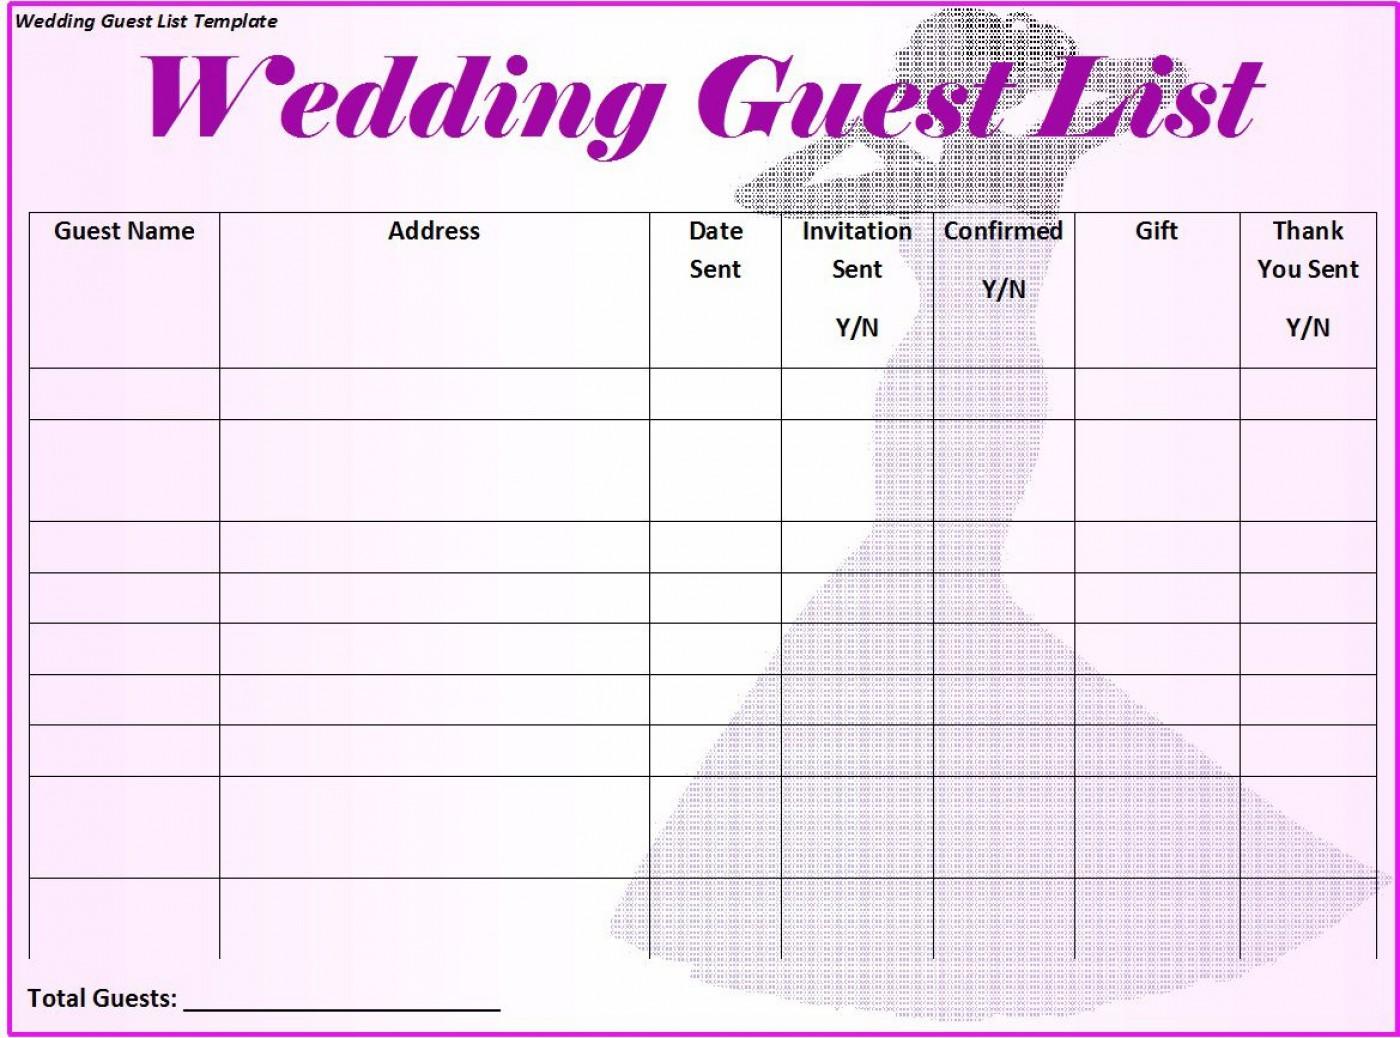 008 Magnificent Wedding Guest List Excel Spreadsheet Template Design 1400